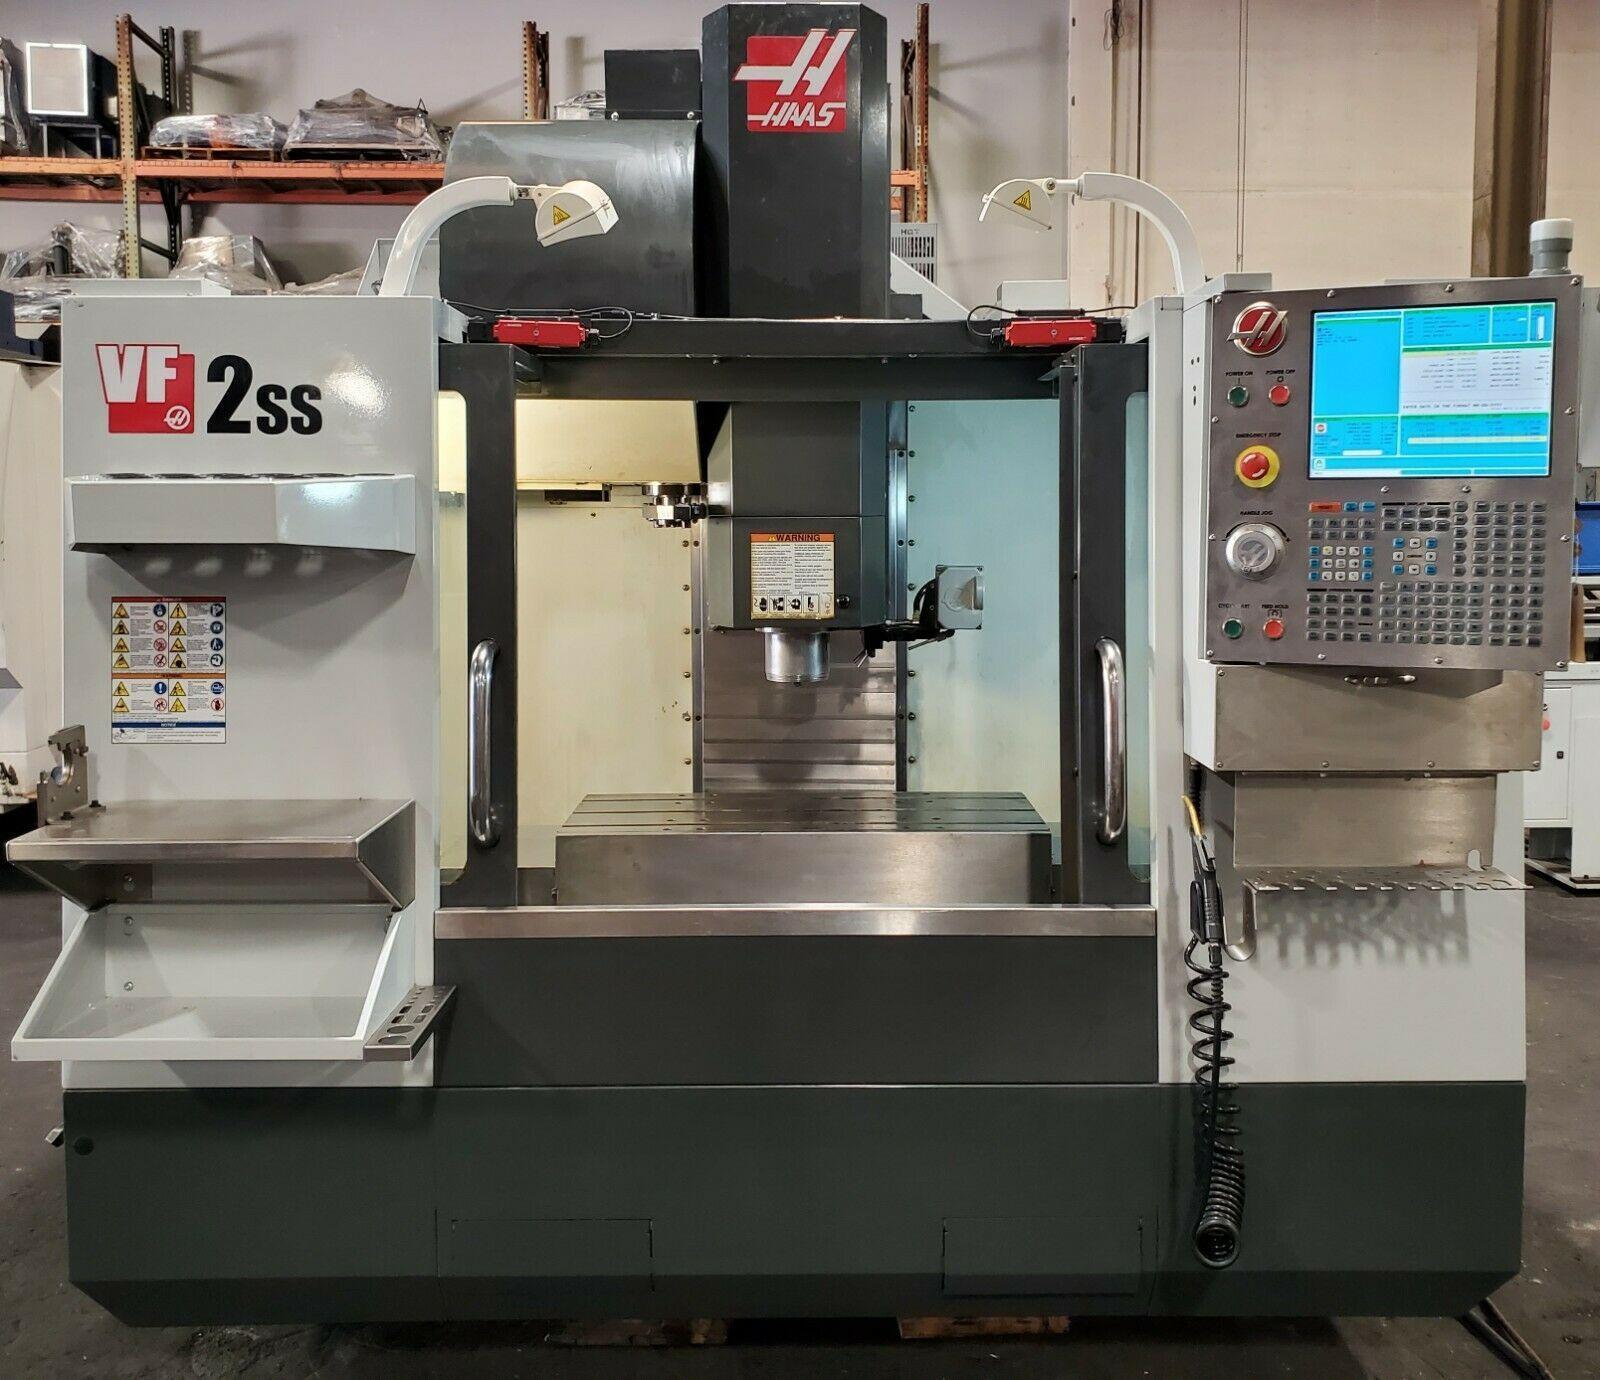 HAAS VF-2SS VERTICAL MACHINING CENTER 4TH AXIS READY CNC MILL